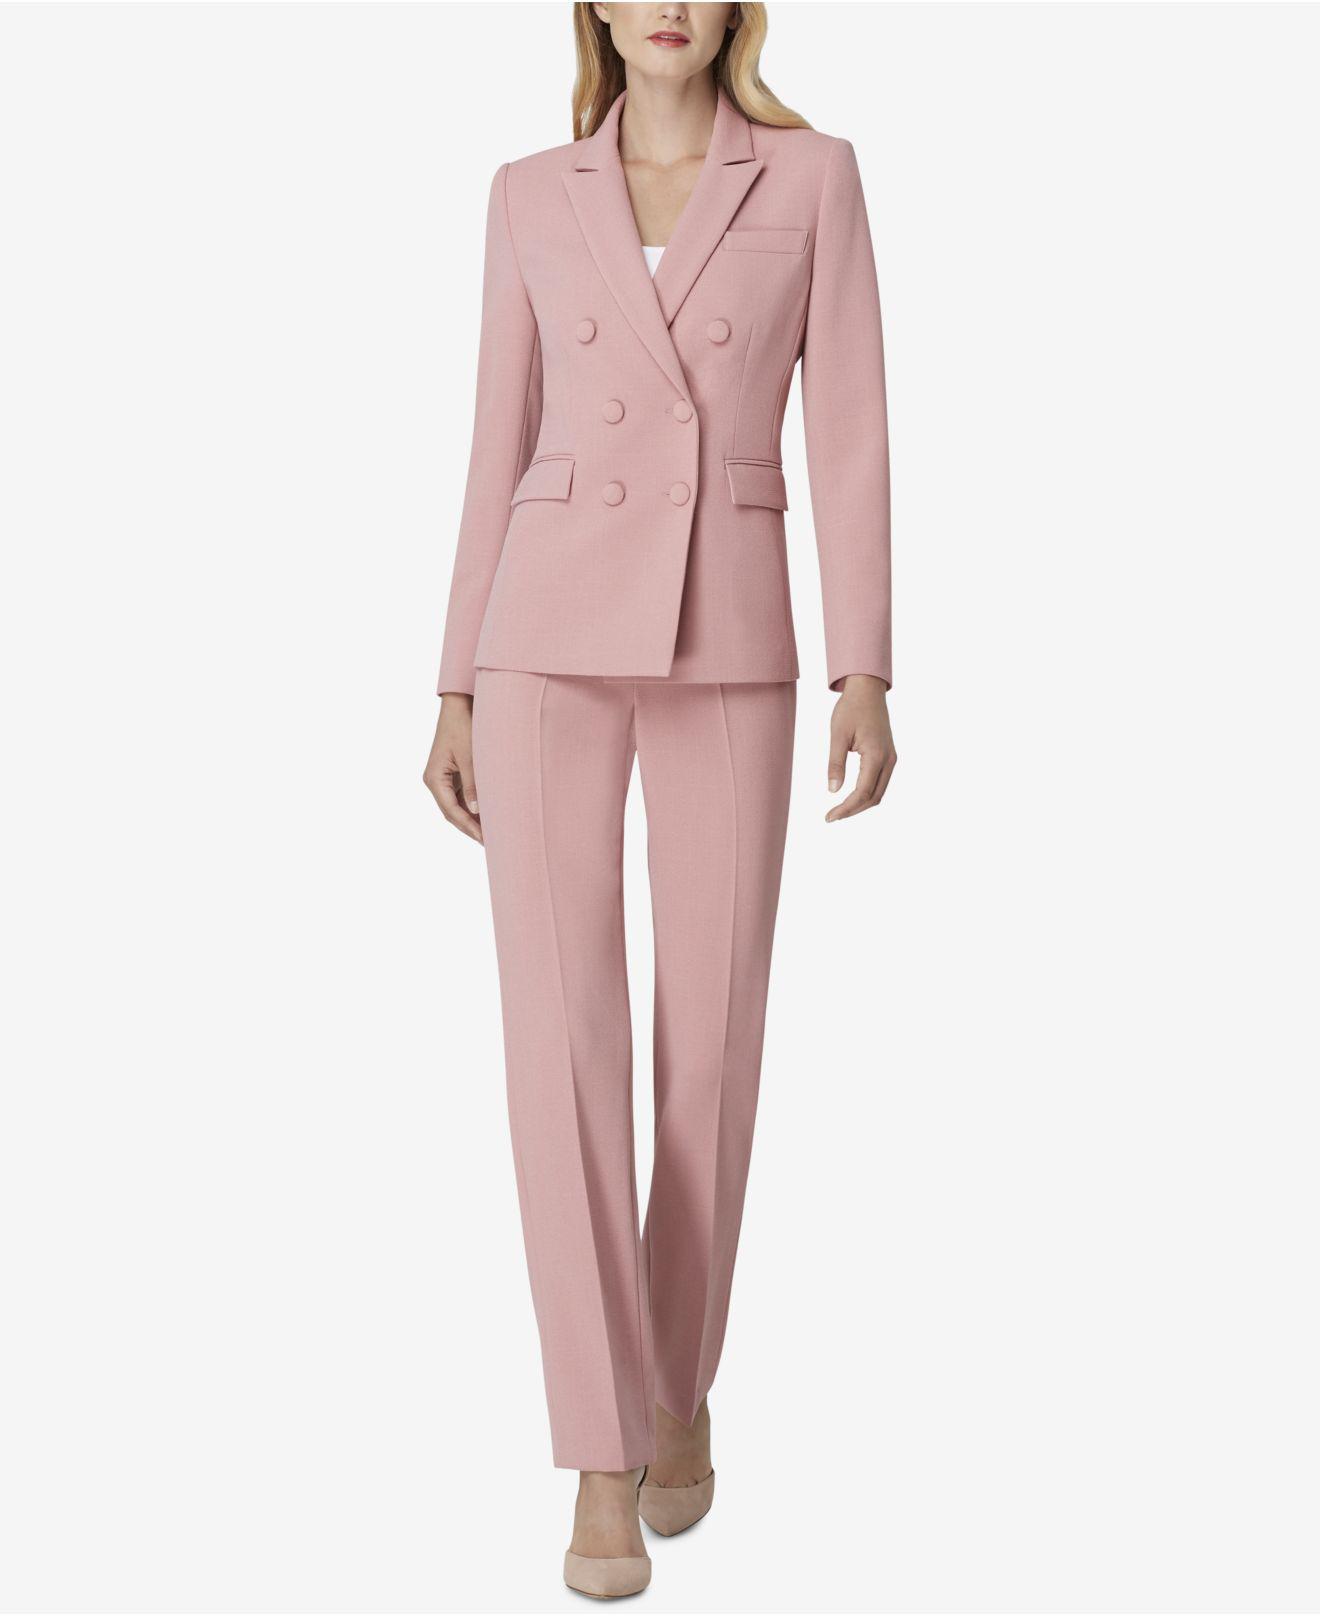 25e90b8eeeff8 Tahari Petite Peak-lapel Pant Suit in Pink - Lyst